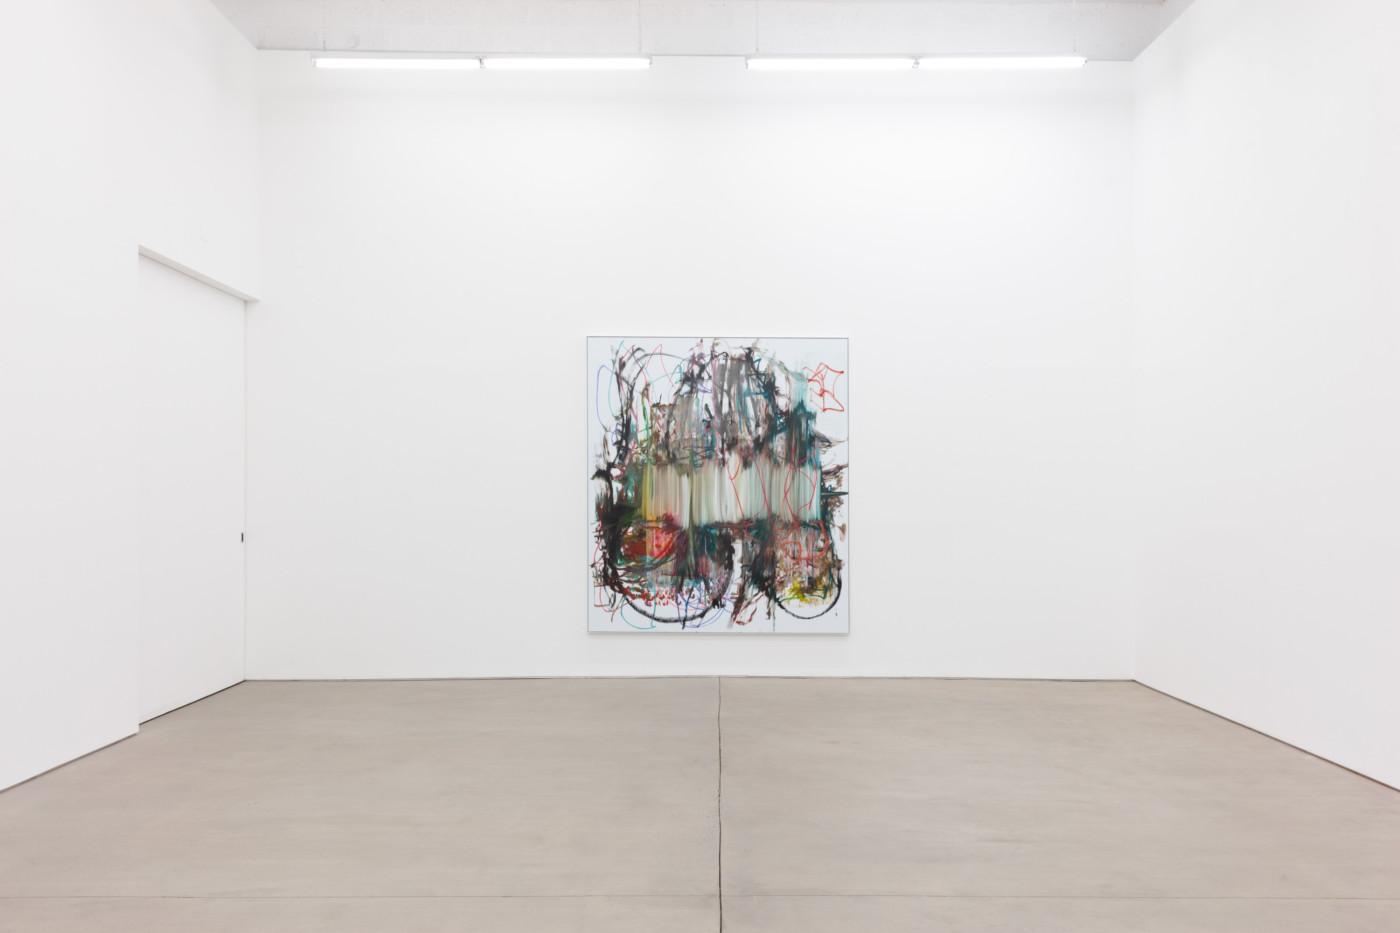 AARON  GARBER-MAIKOVSKA  postpartum , 2018, Clearing, New York,  installation view - High Art Gallery Paris